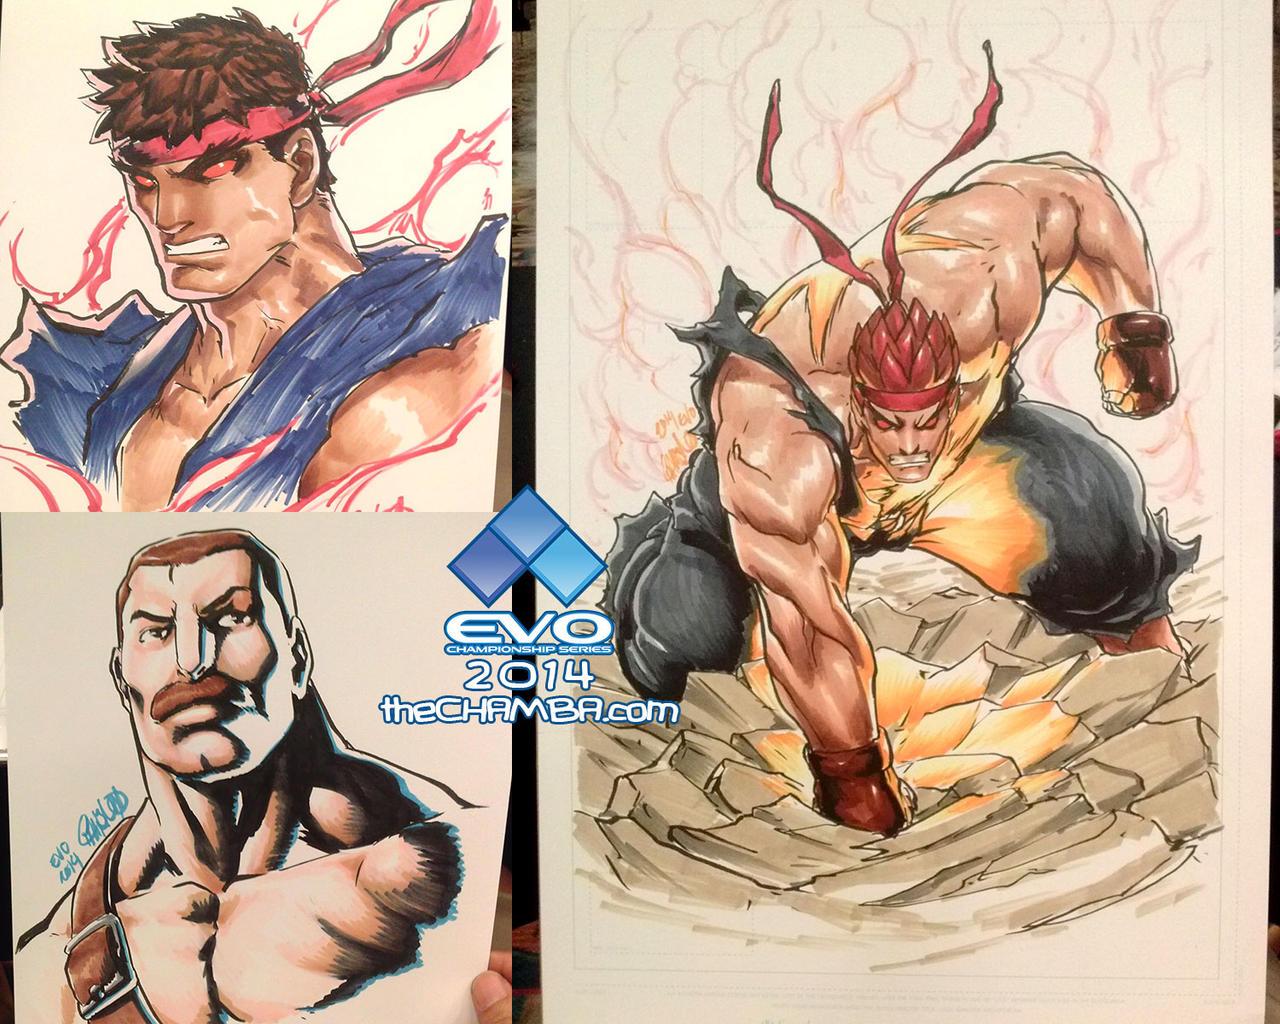 EVO 2014 - 01 - Evil Ryu x2 + Mike Haggar by theCHAMBA